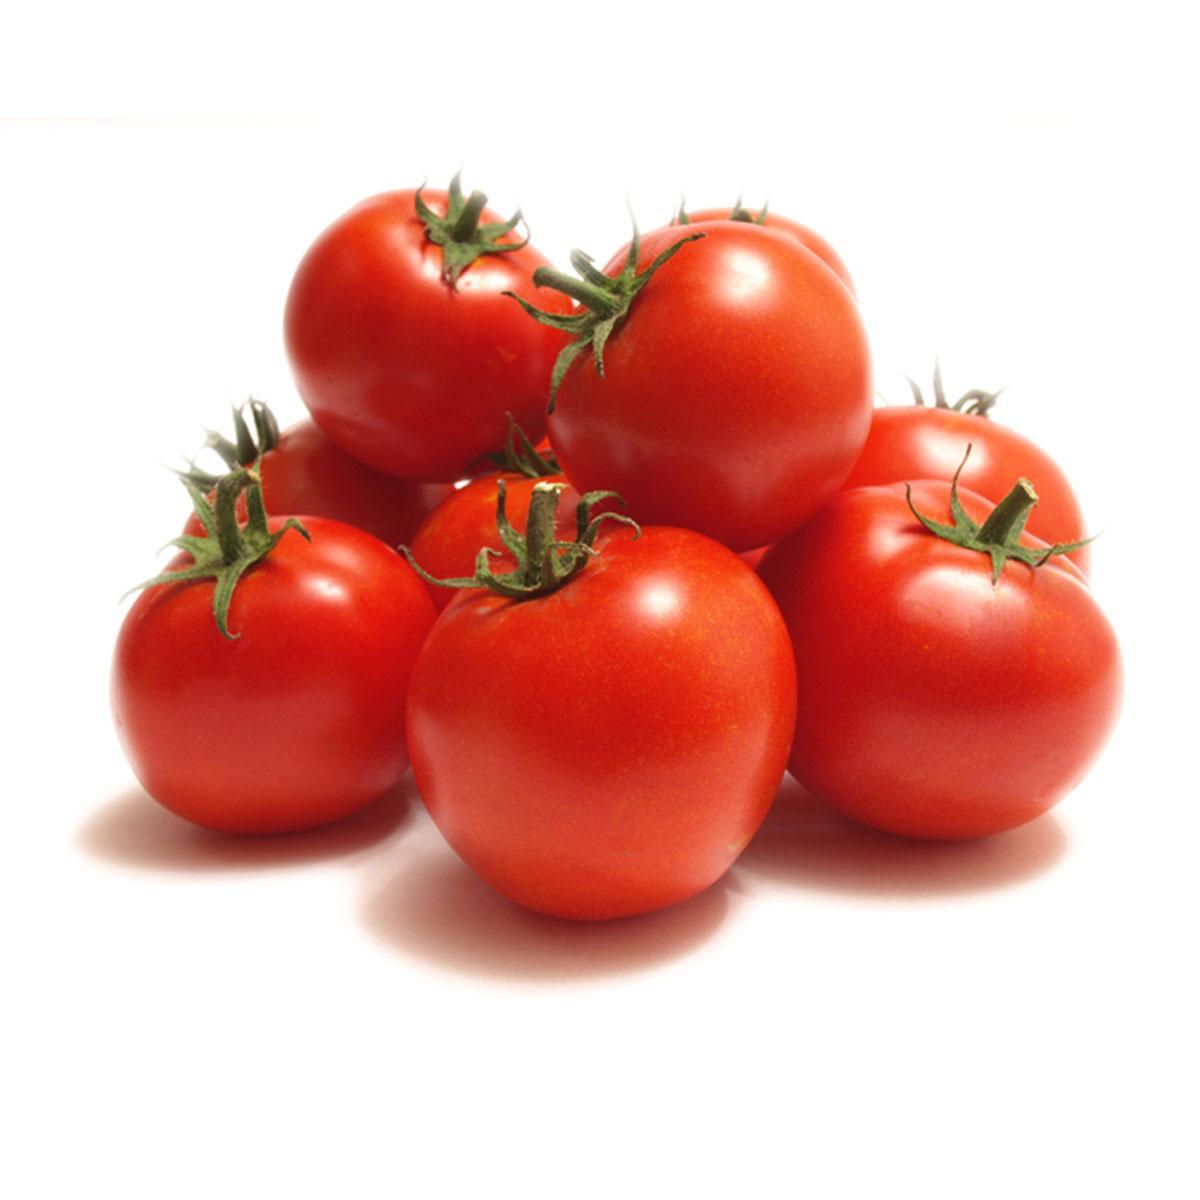 Tomato Jordan